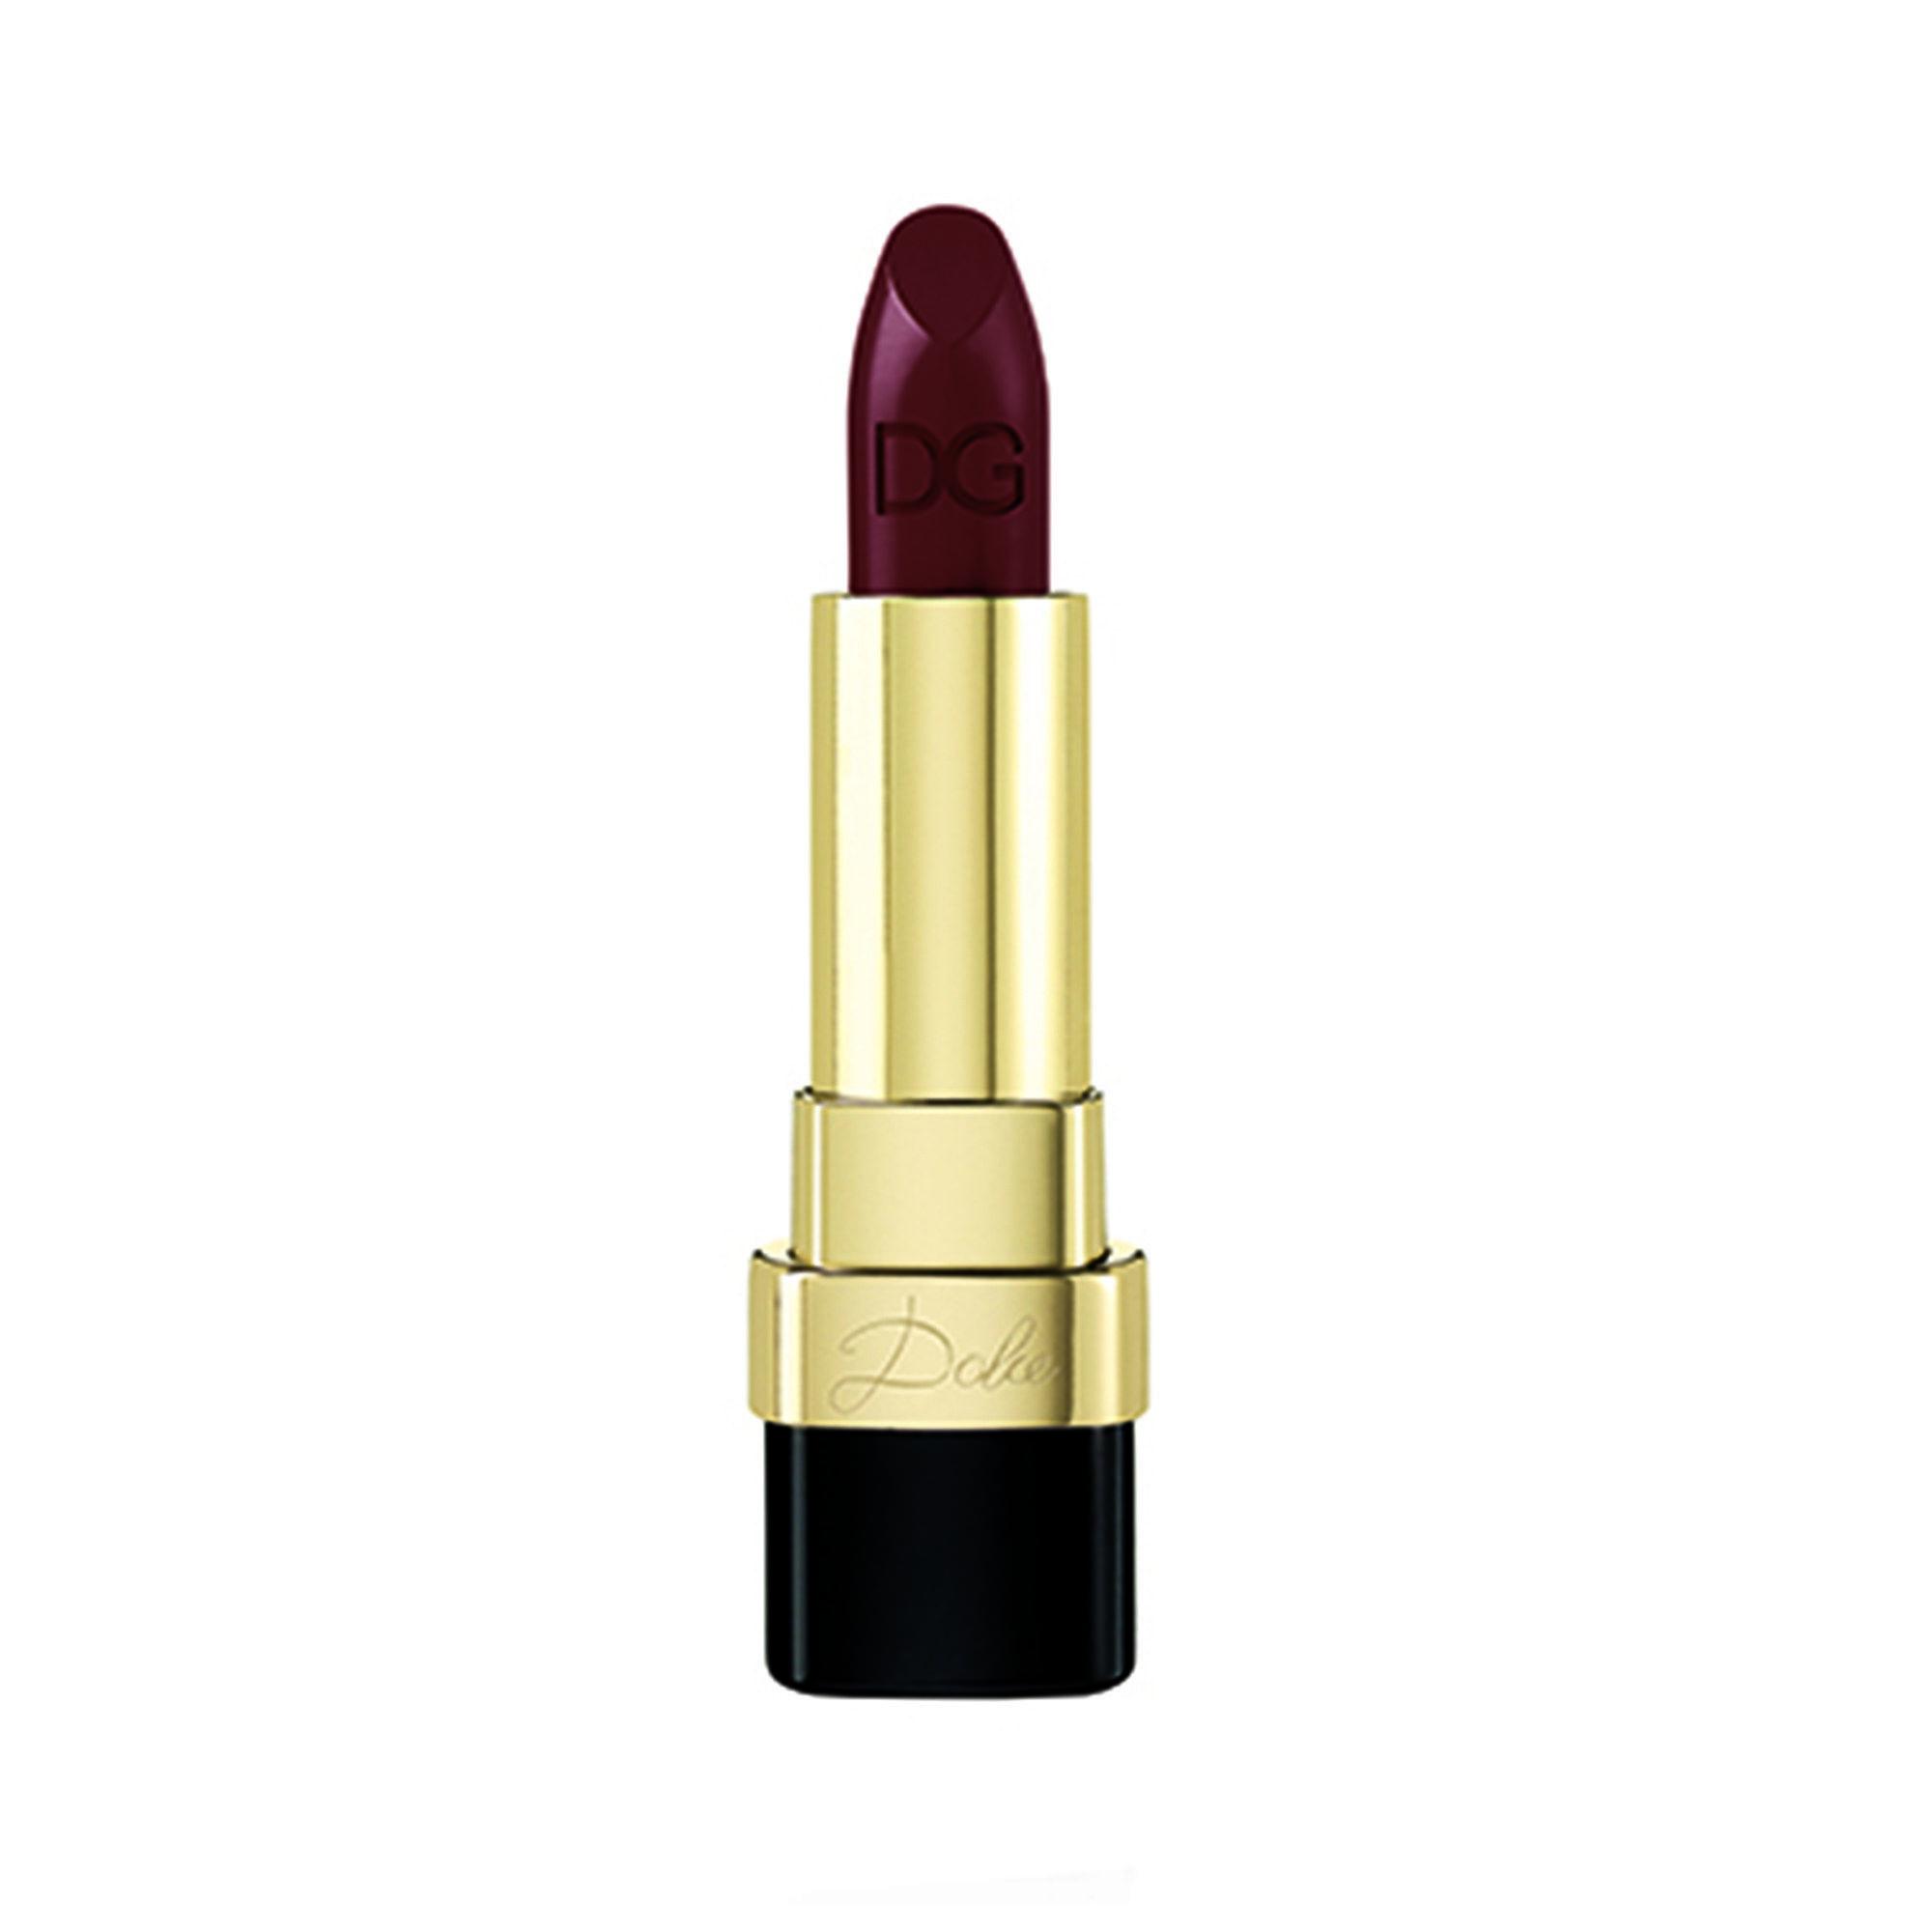 The 25 Best Dark Lipsticks to Wear All Fall Long | Allure